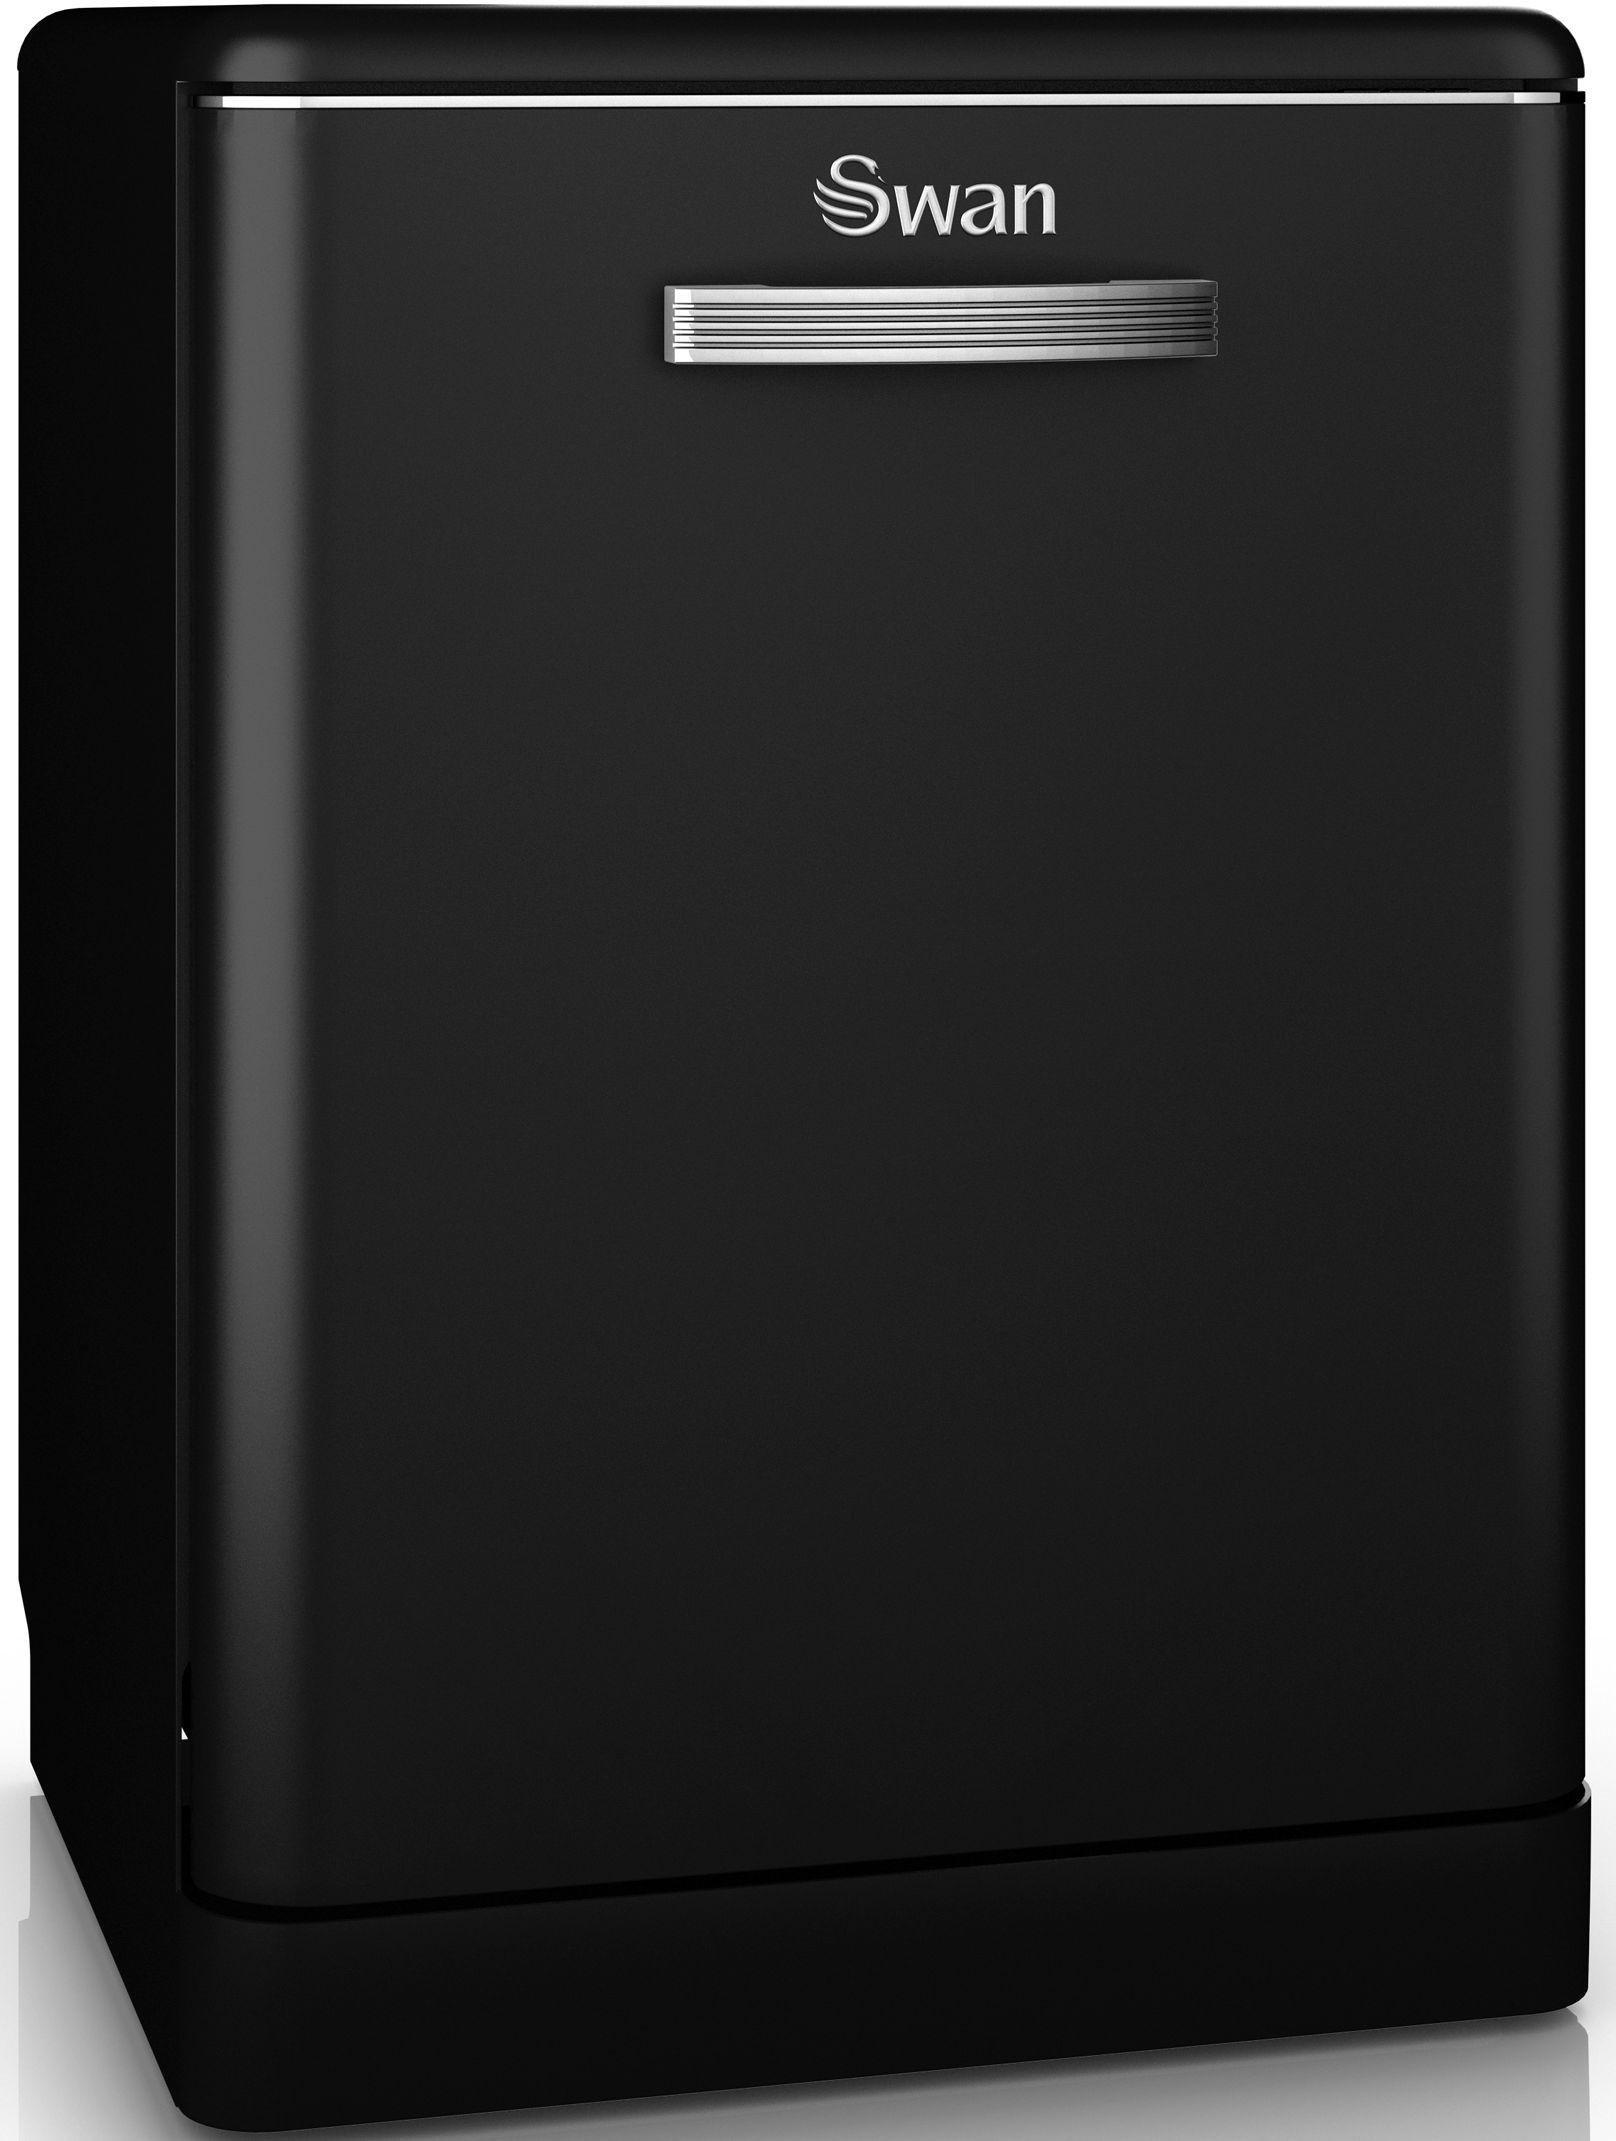 swan-sdw7040bn-retro-dishwasher-black